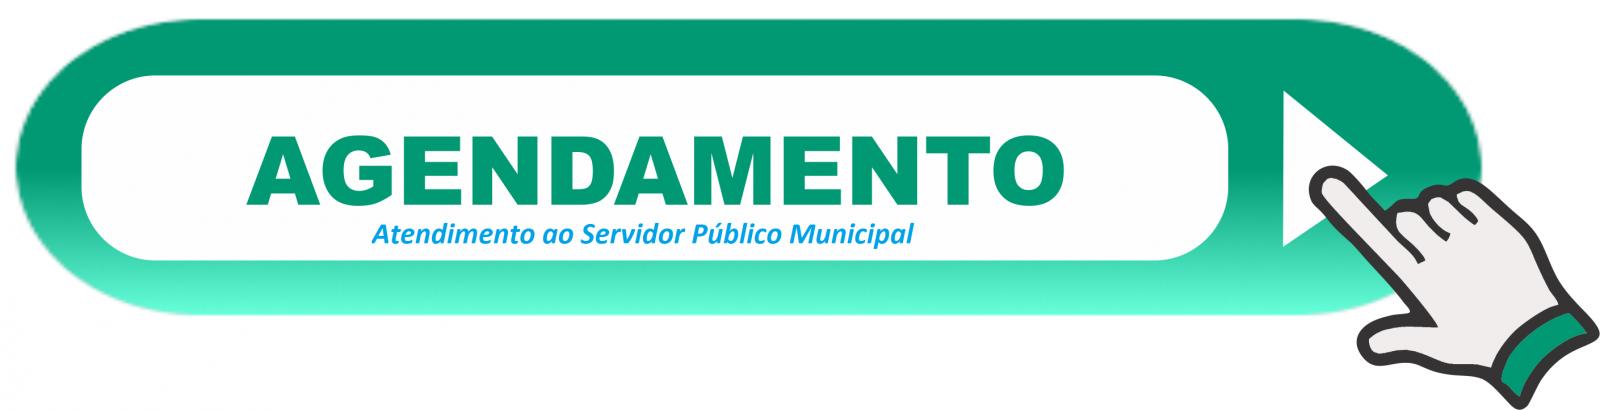 Agendamento Online - Atendimento Servidor Público